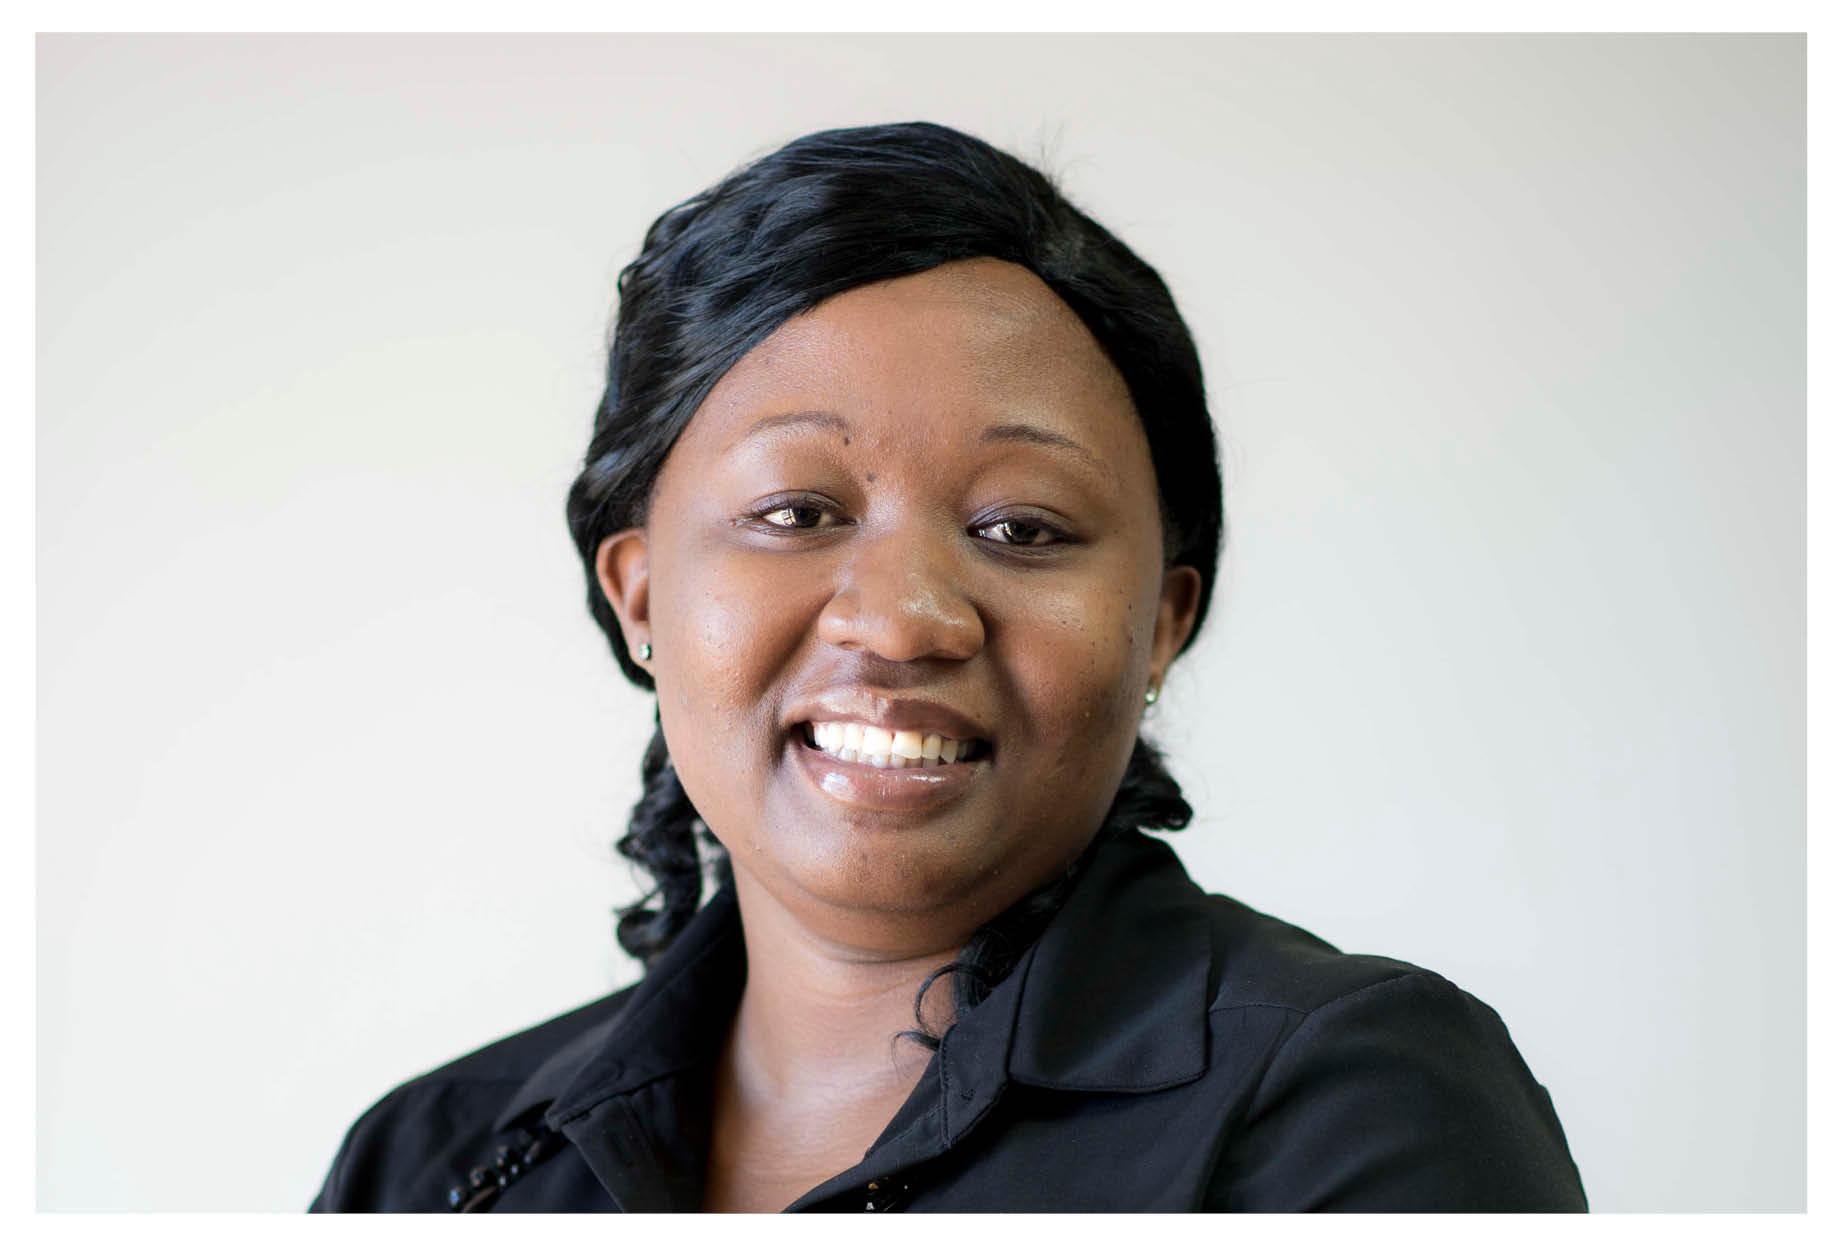 Lerato Mofokeng